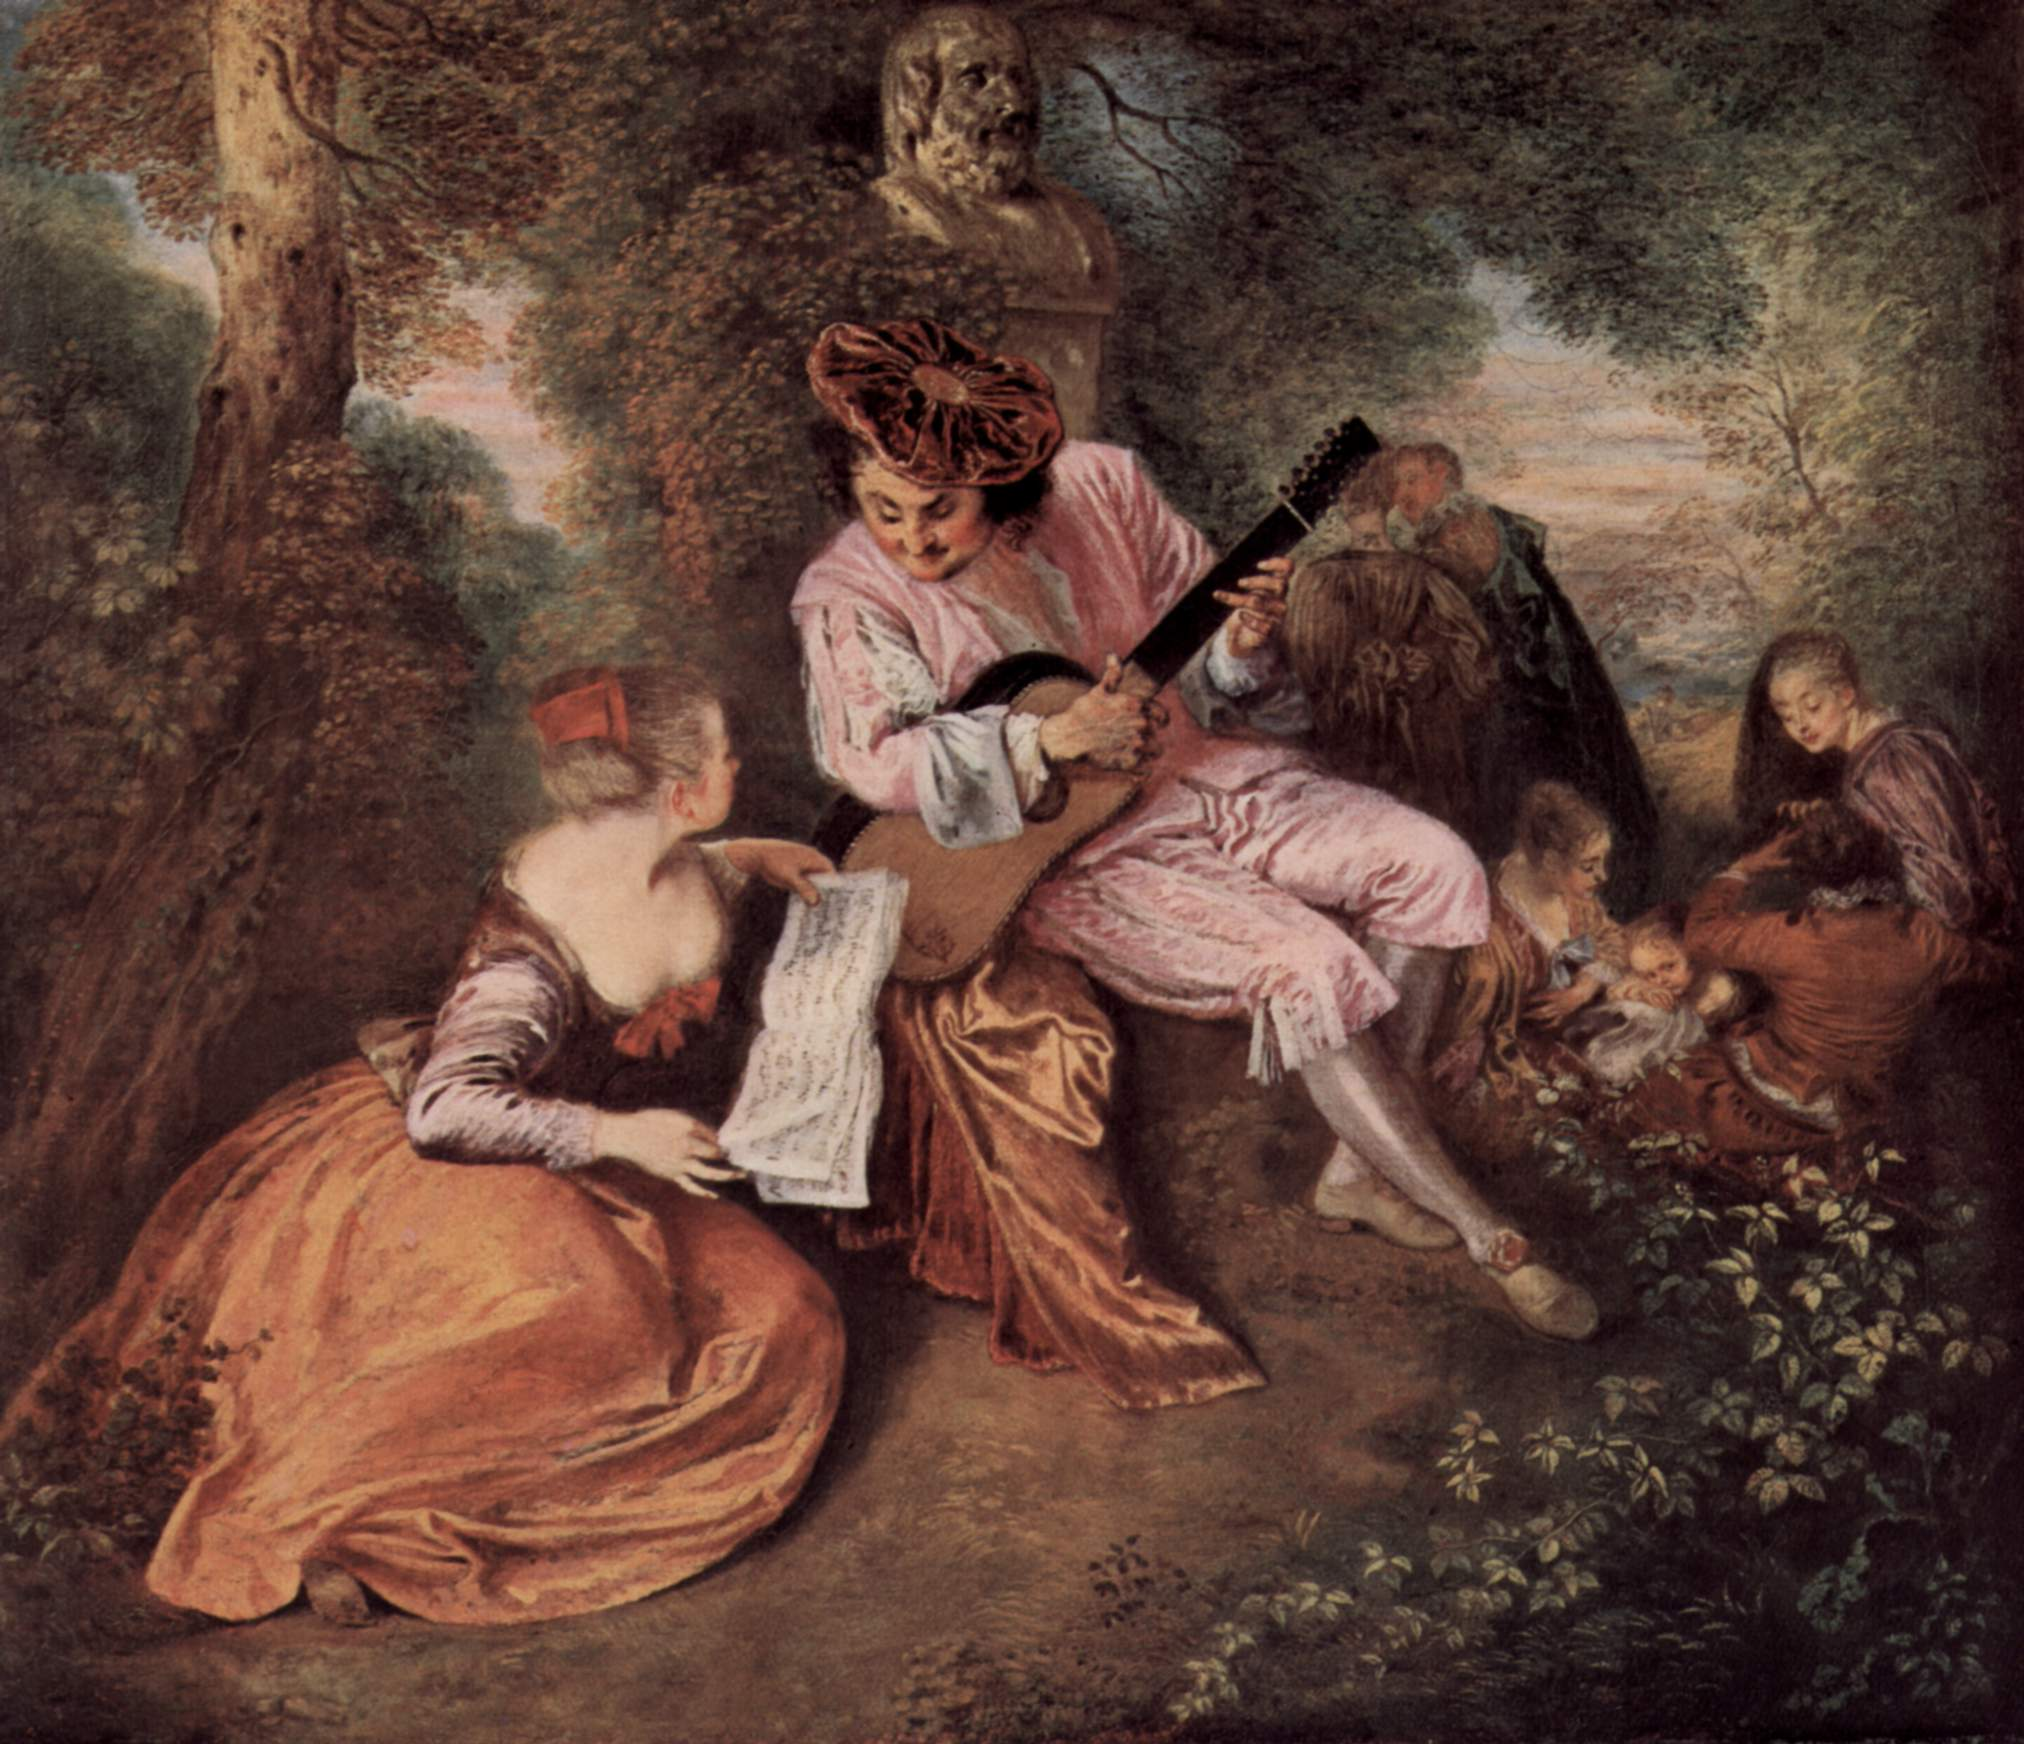 Jean-Antoine Watteau, The Scale of Love, Ekphrasis